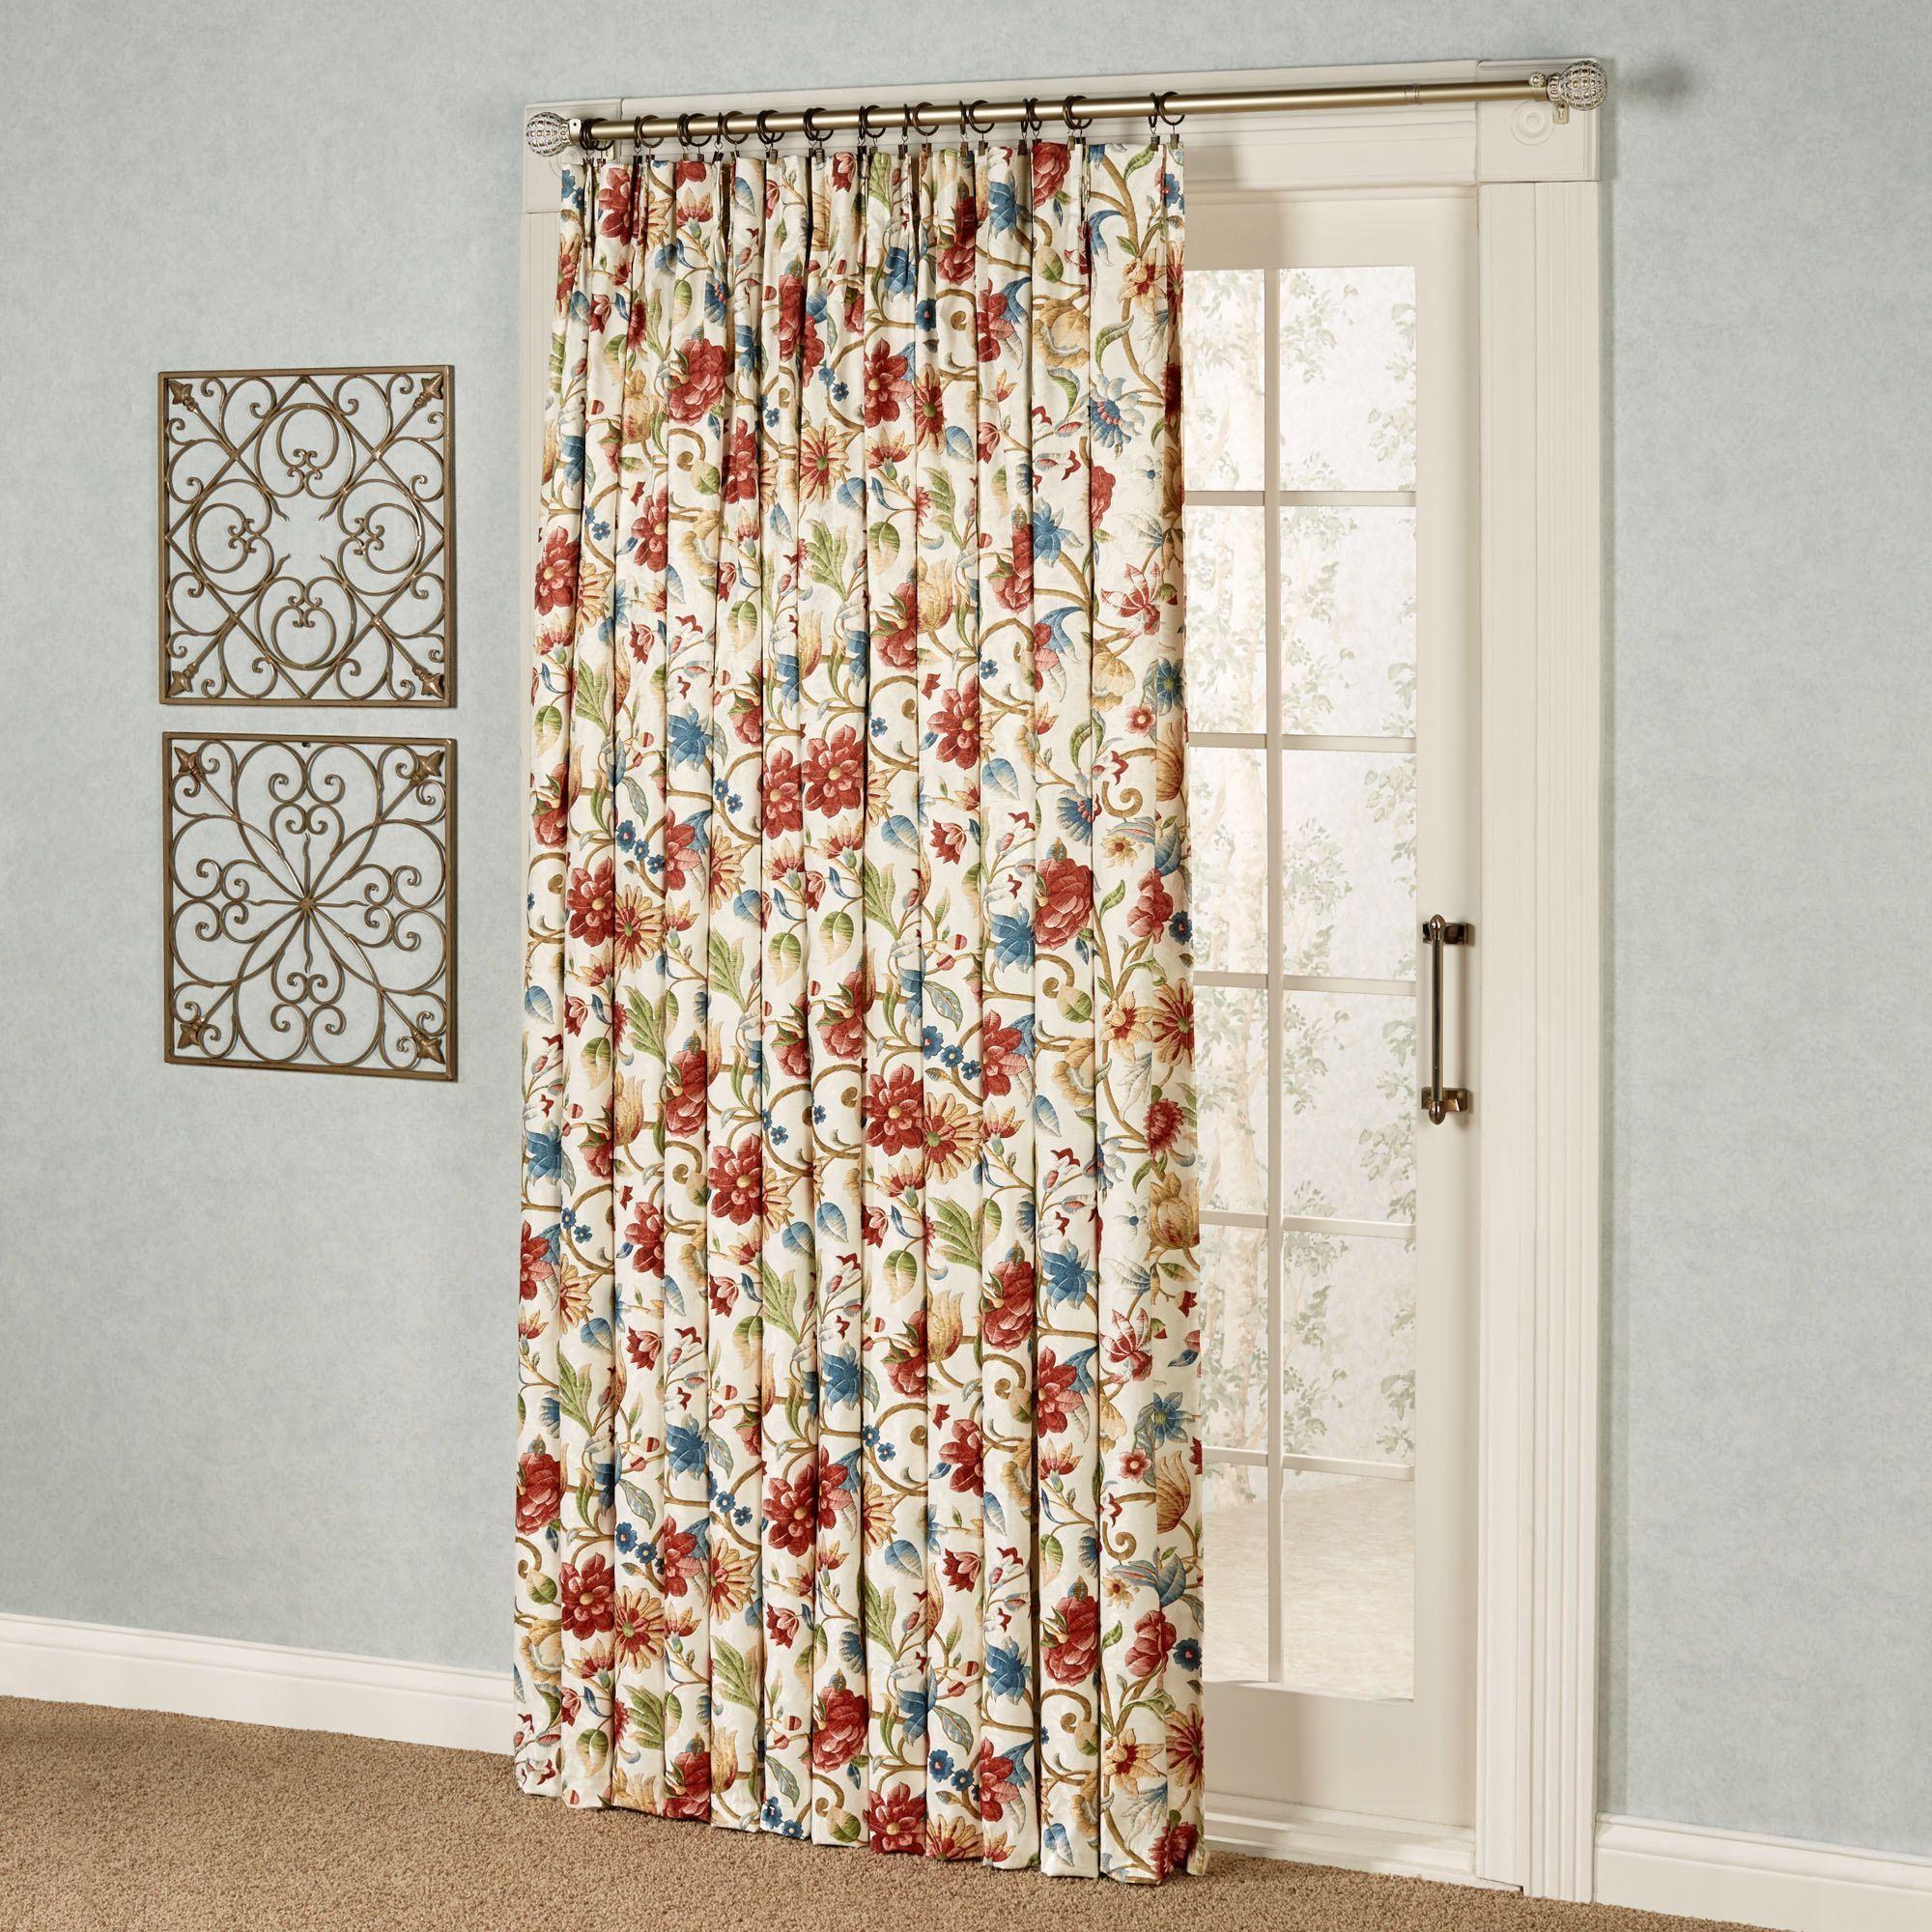 Cornwall Pinch Pleat Thermal Room Darkening Floral Patio Panel